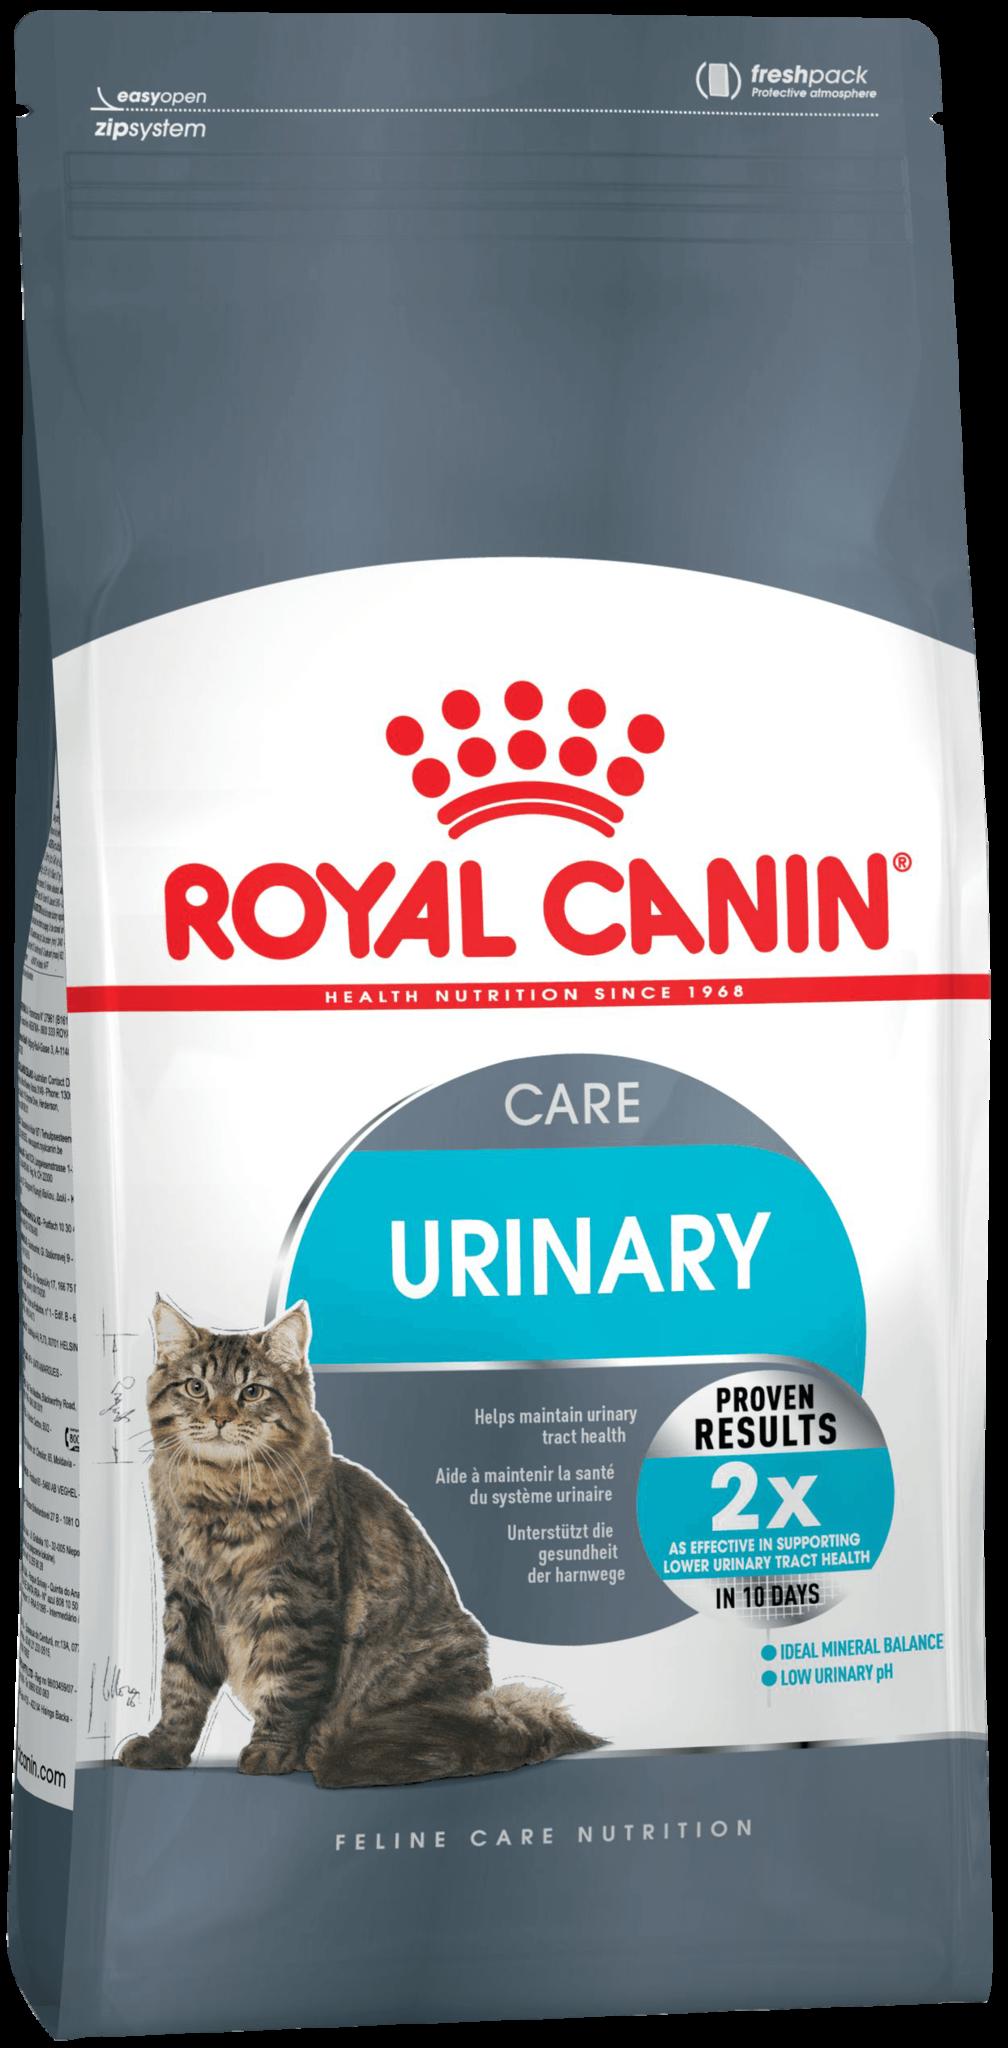 Royal Canin Корм для кошек, Royal Canin Urinary Care, в целях профилактики МКБ f_urinary-care.png